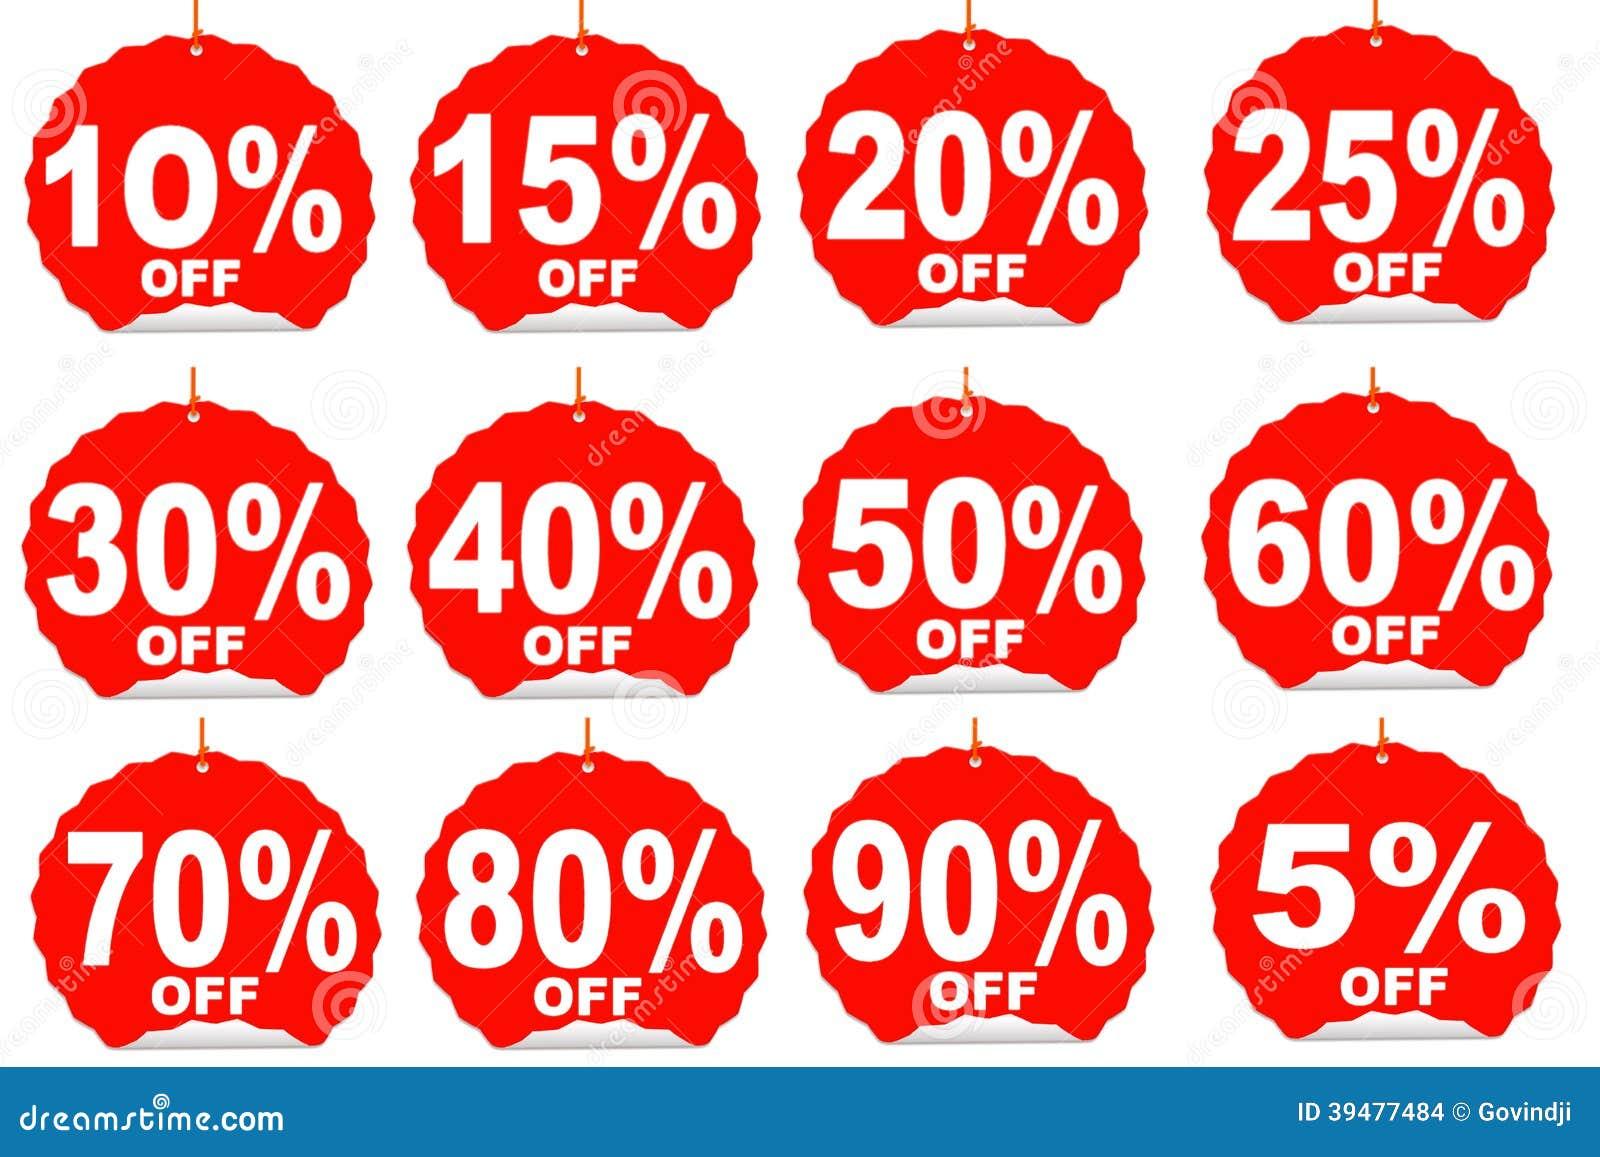 LAMKIN SONAR+ WRAP CALIBRATE GRIP   Discount Prices for